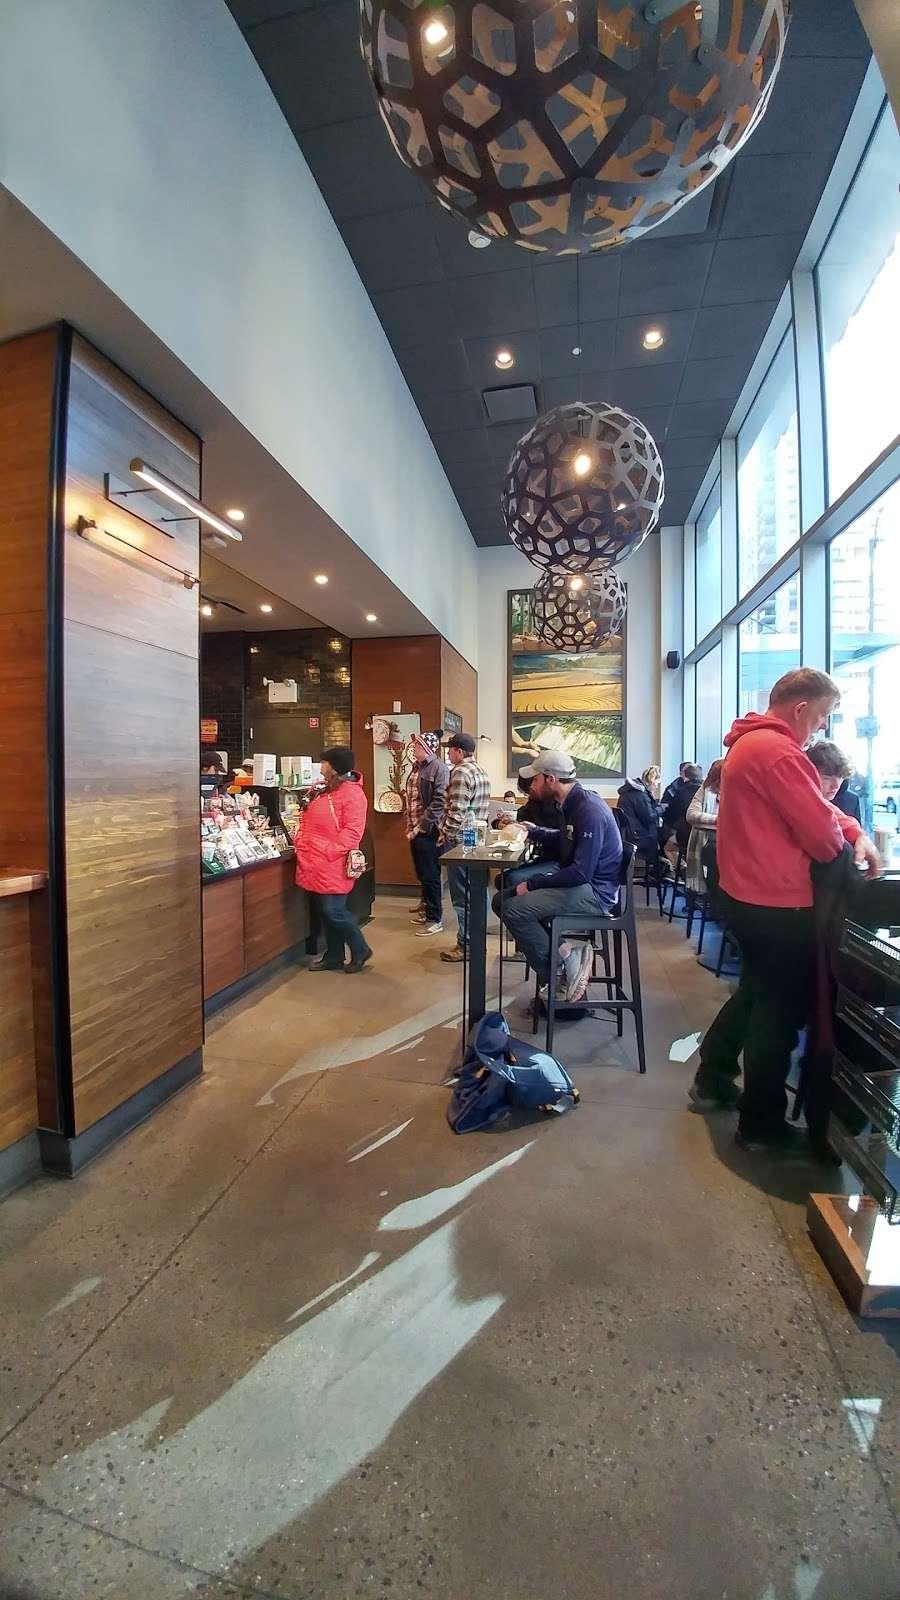 Starbucks - cafe  | Photo 3 of 10 | Address: 350 W 42nd St, New York, NY 10036, USA | Phone: (212) 244-4176